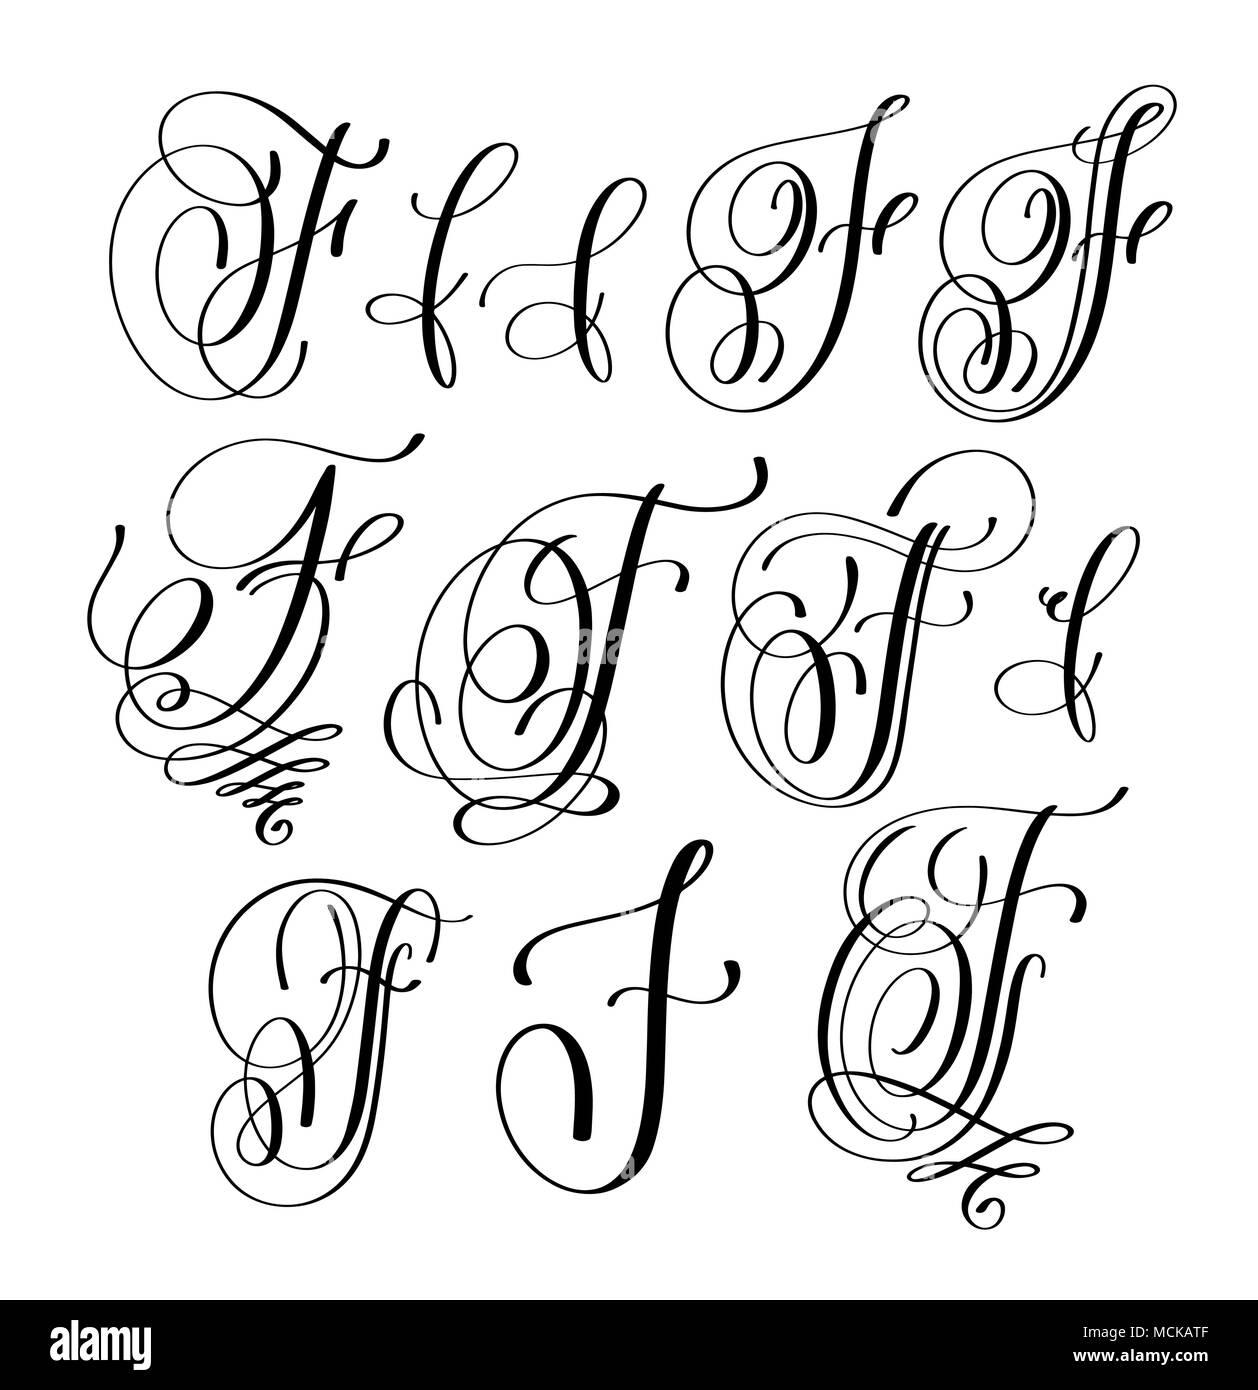 Calligraphie Lettre lettrage calligraphie script f définie, la signature manuscrite